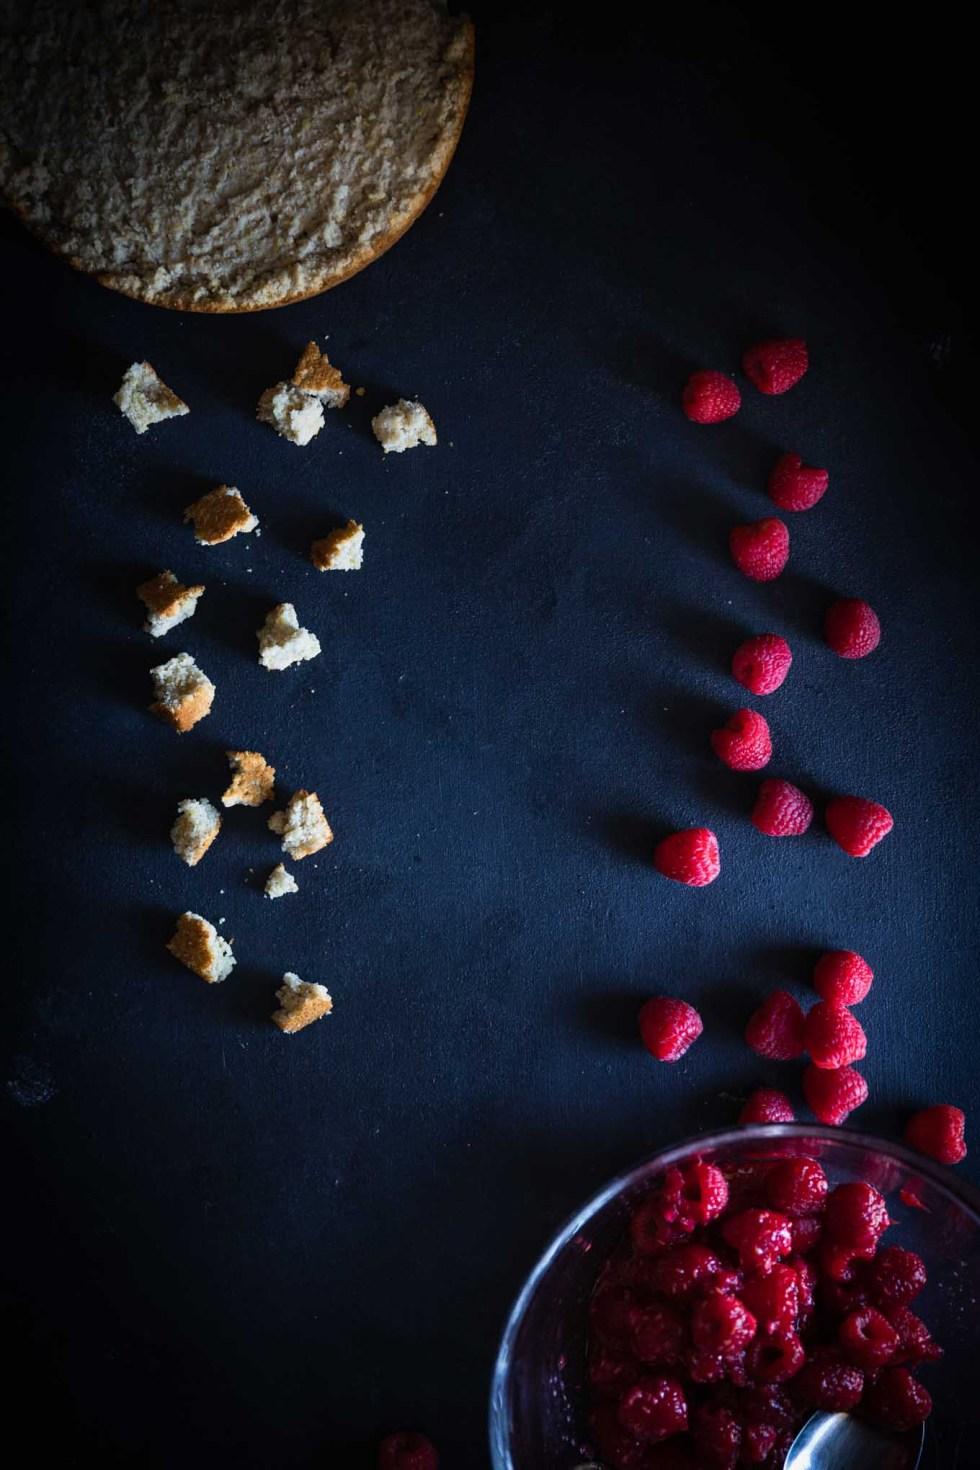 Dark Food Photography | Moody Photography | Chiaroscuro | Baking | Dessert | Food Blogging